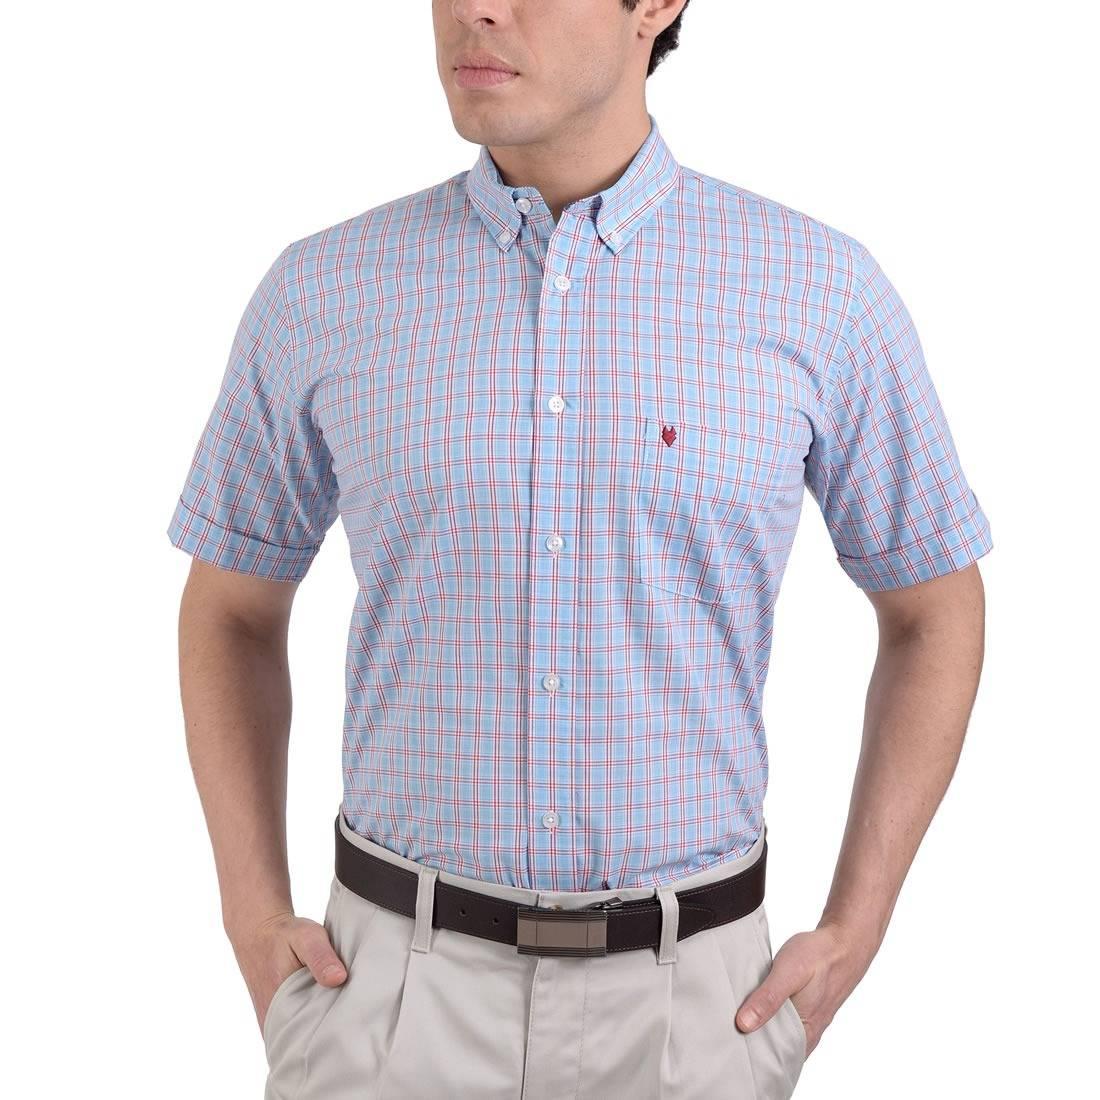 042204431223-01-Camisa-Casual-Manga-Corta-Modern-Fit-Azul-Francia-yale